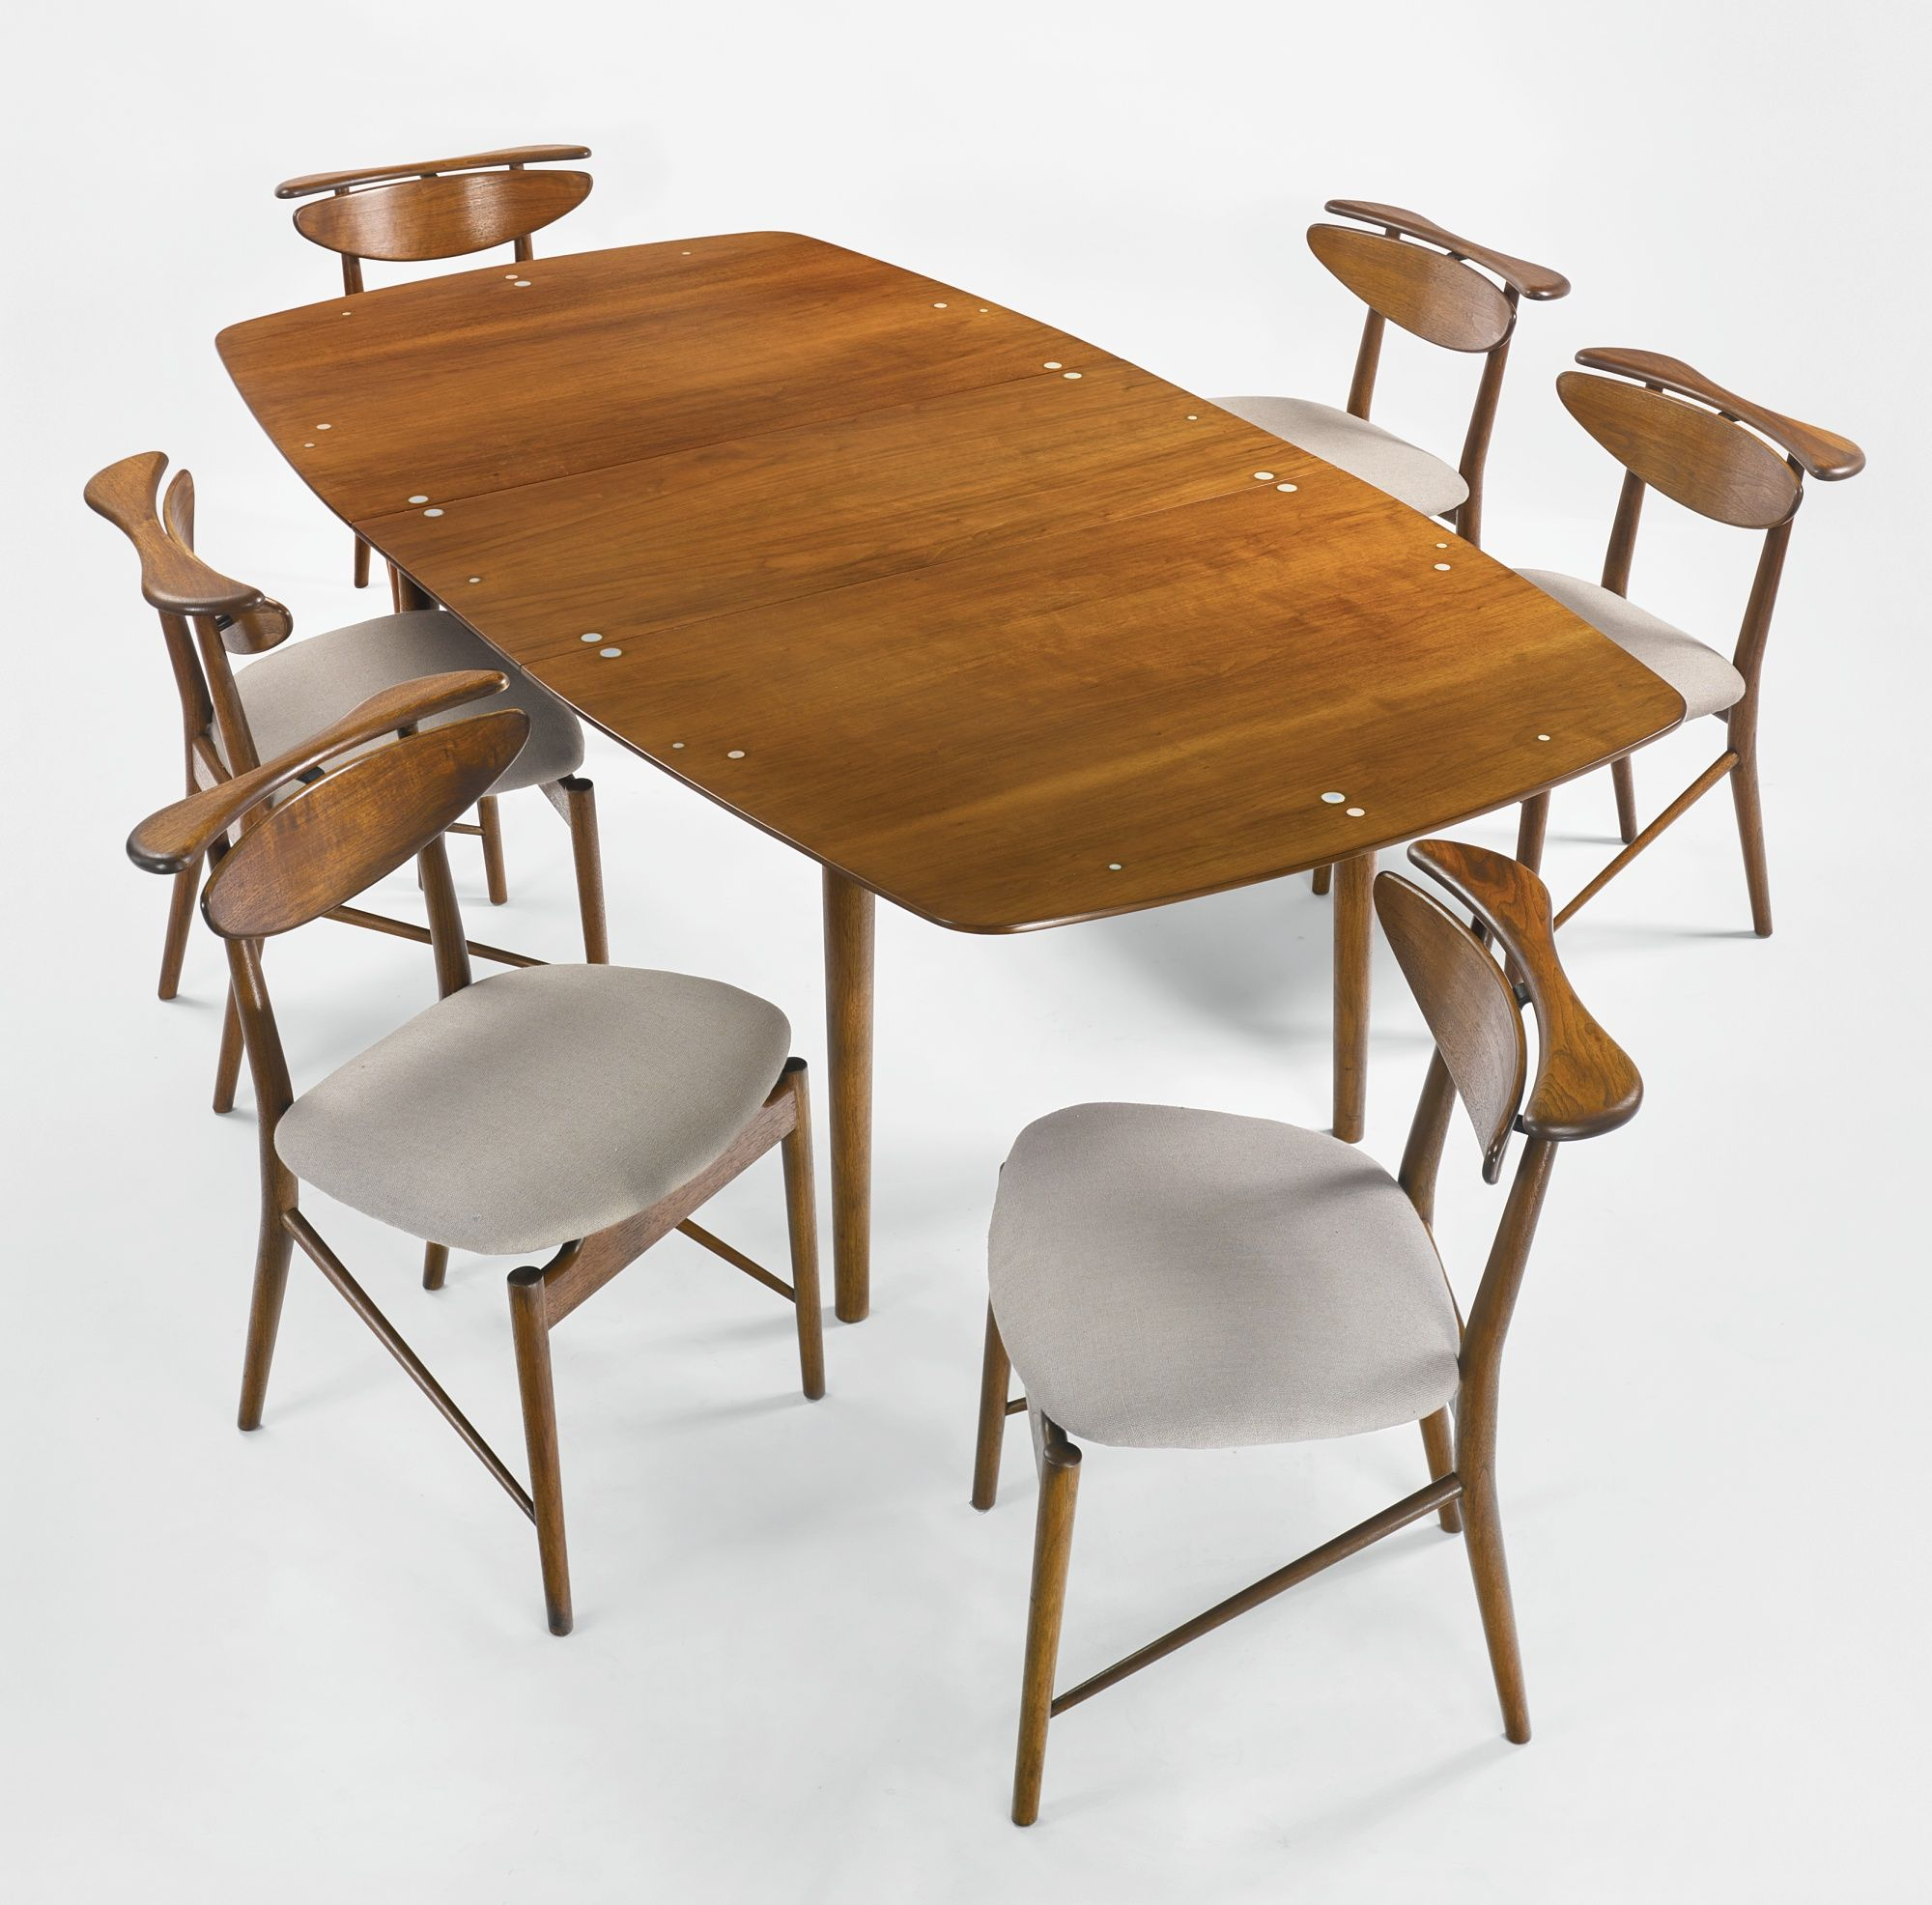 Finn Juhl 401 Walnut With Brass Inlay Dining Table For Baker